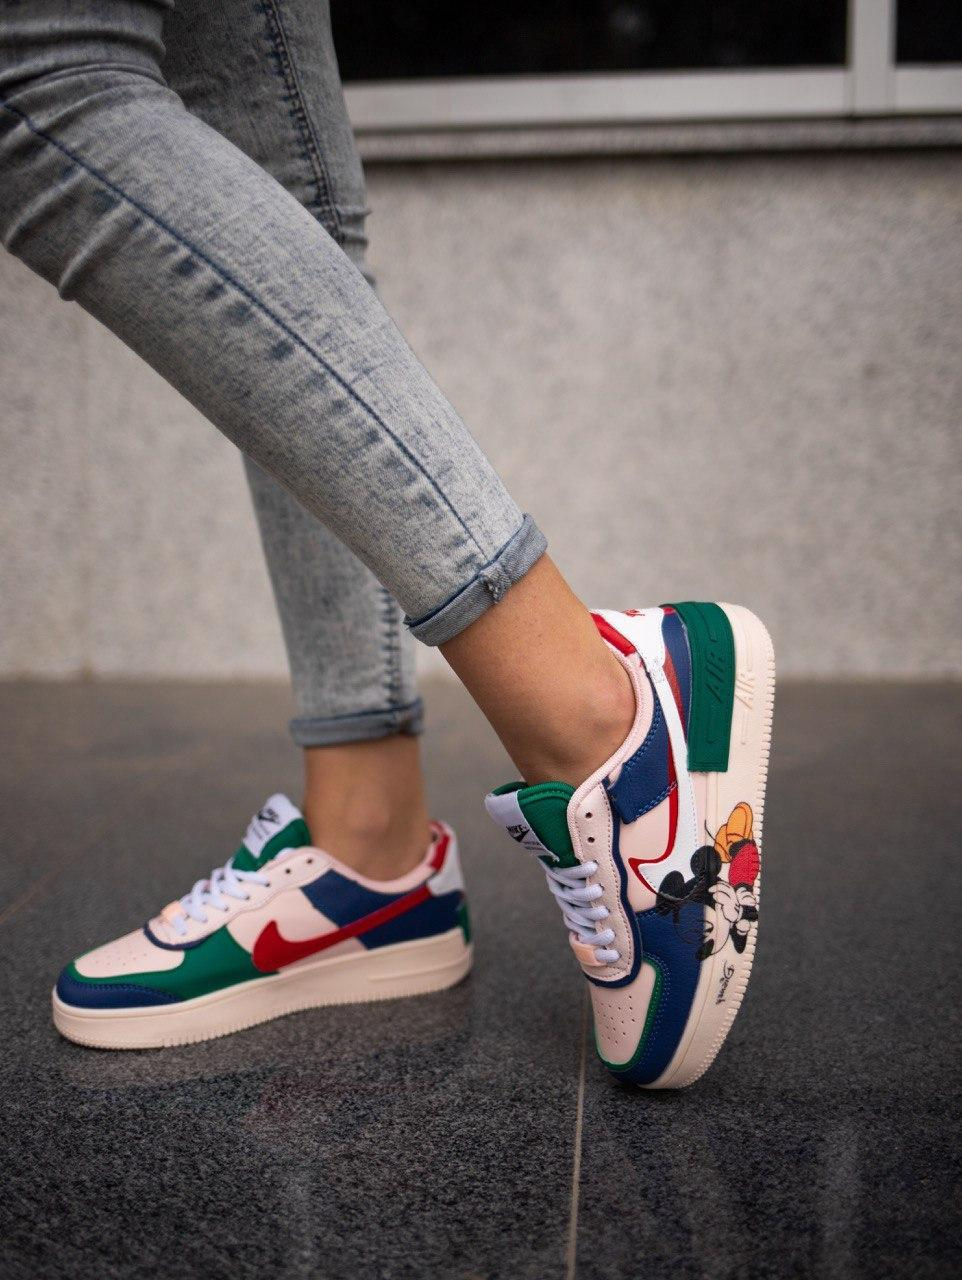 Кросівки жіночі Nike Nike Air Force Shadow Pink Blue Mickey Mouse